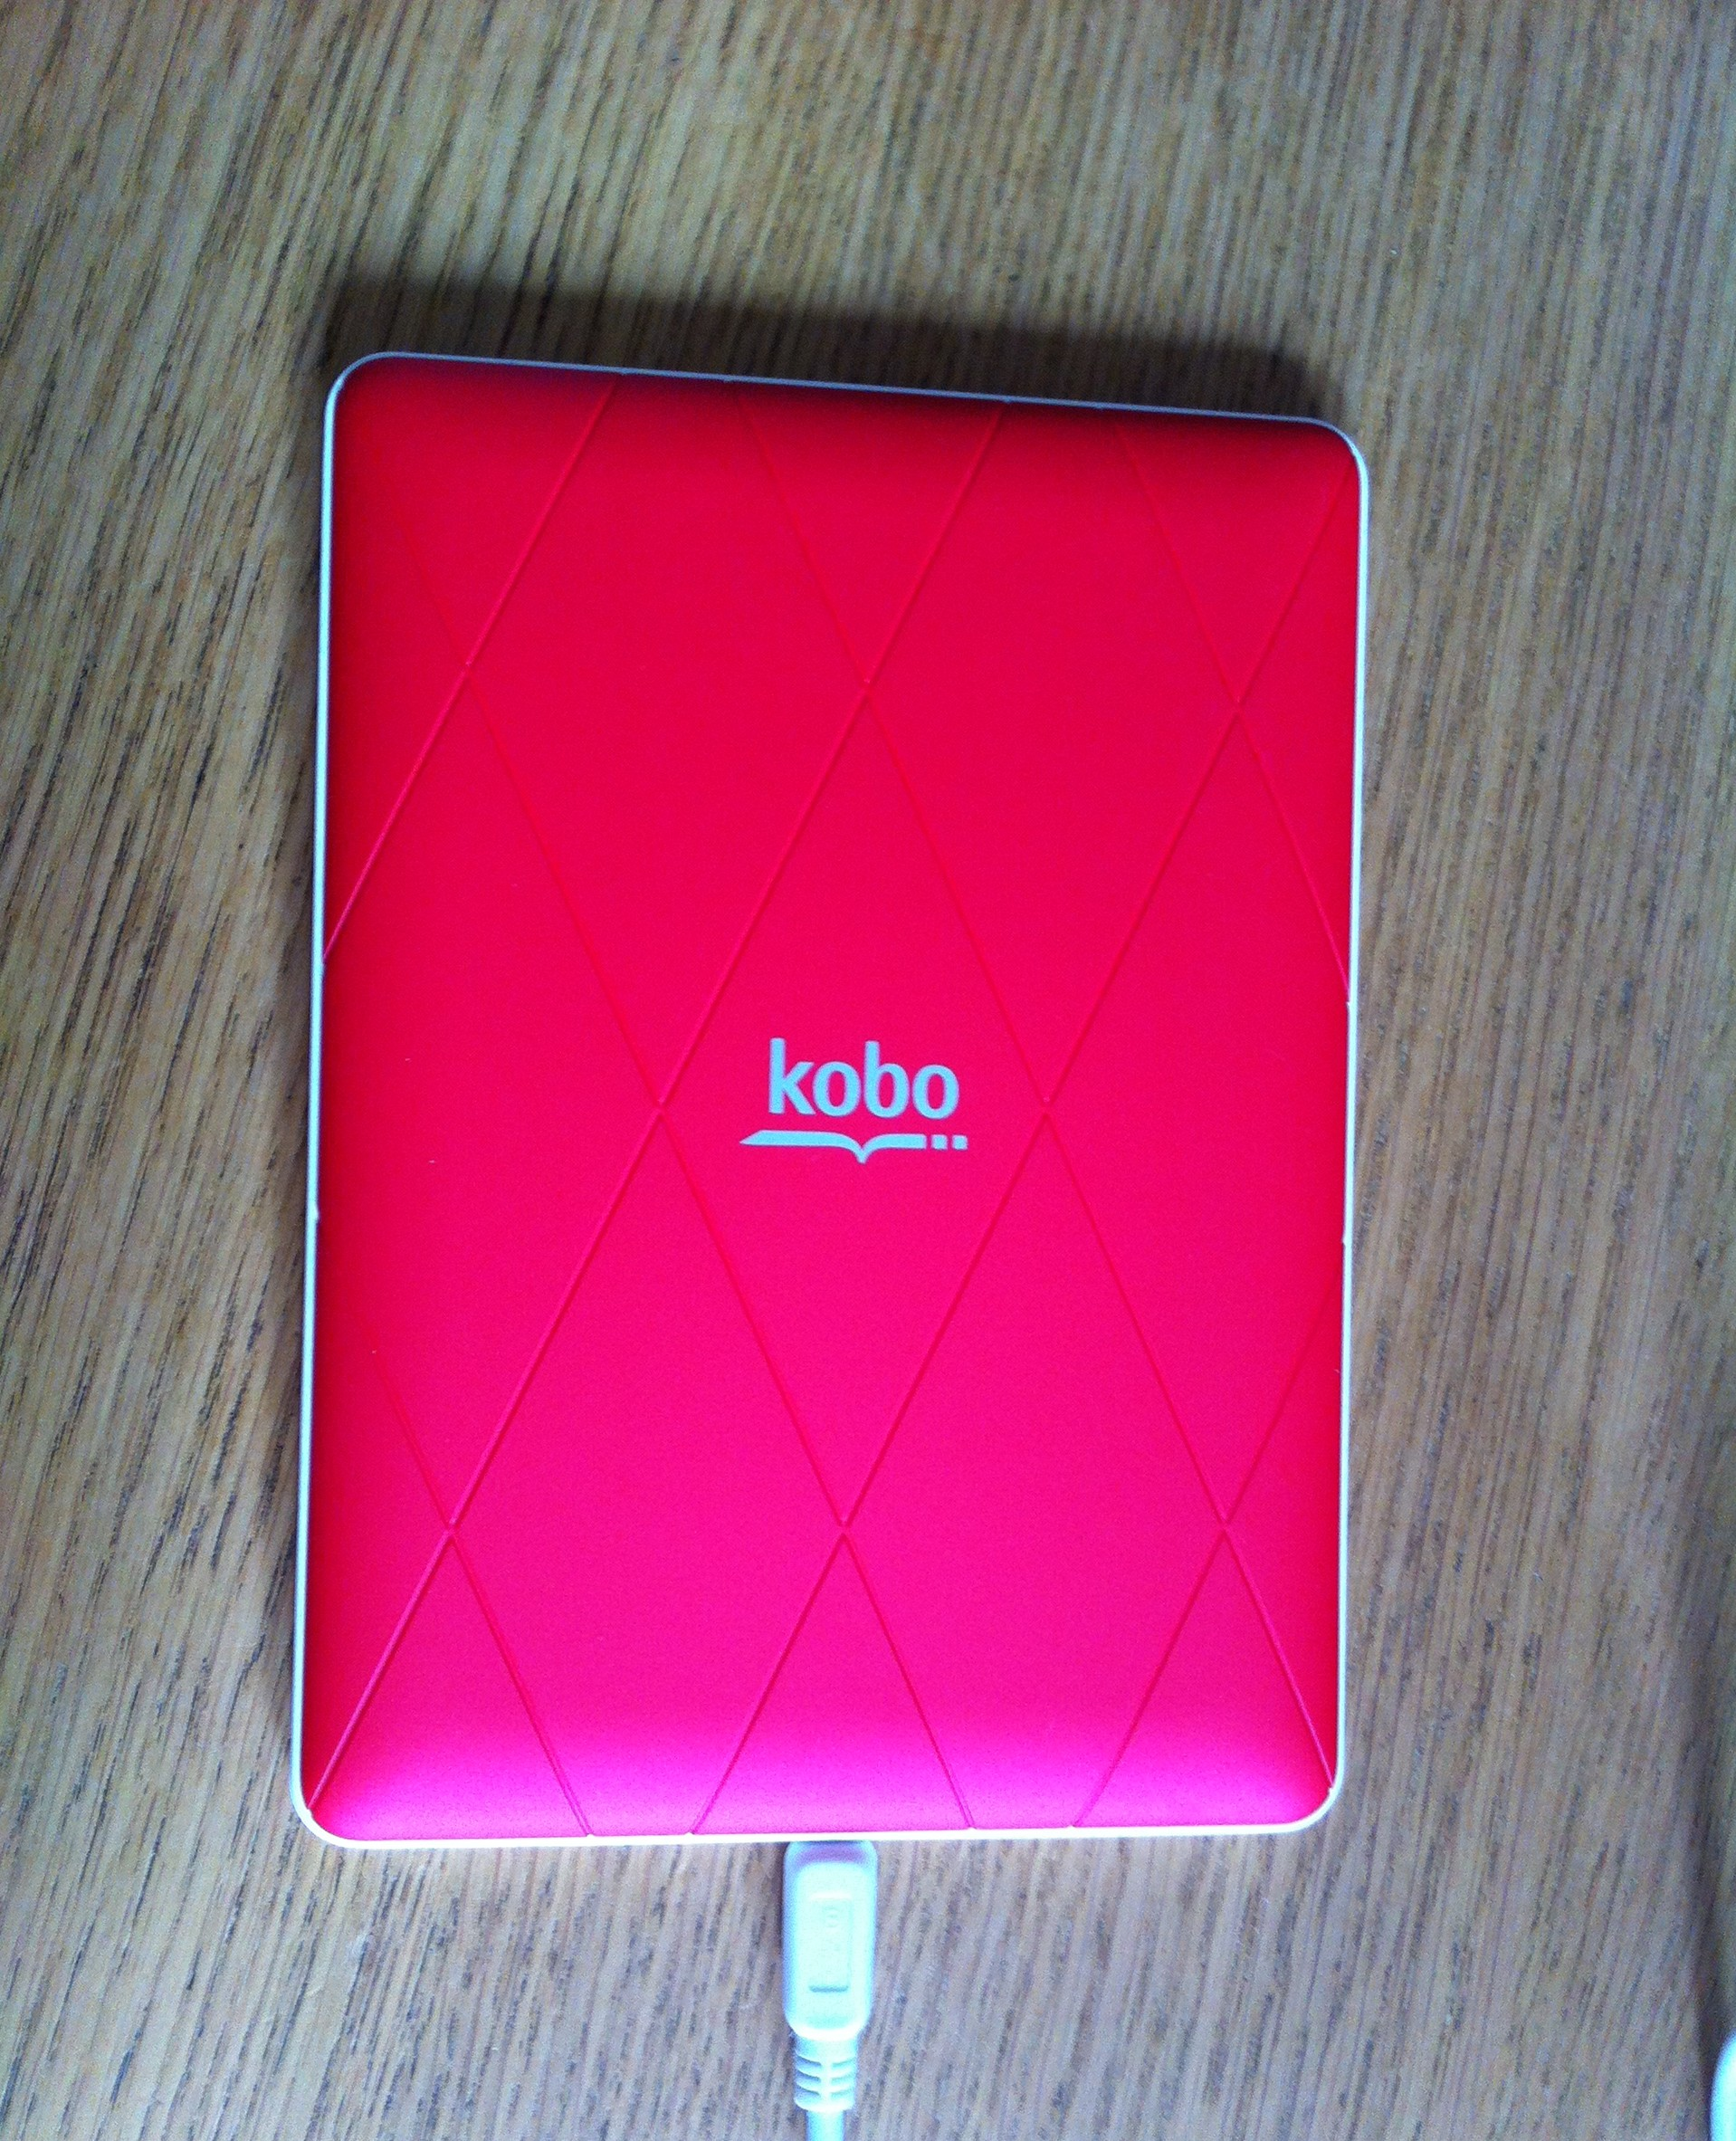 201402 Kobo 2